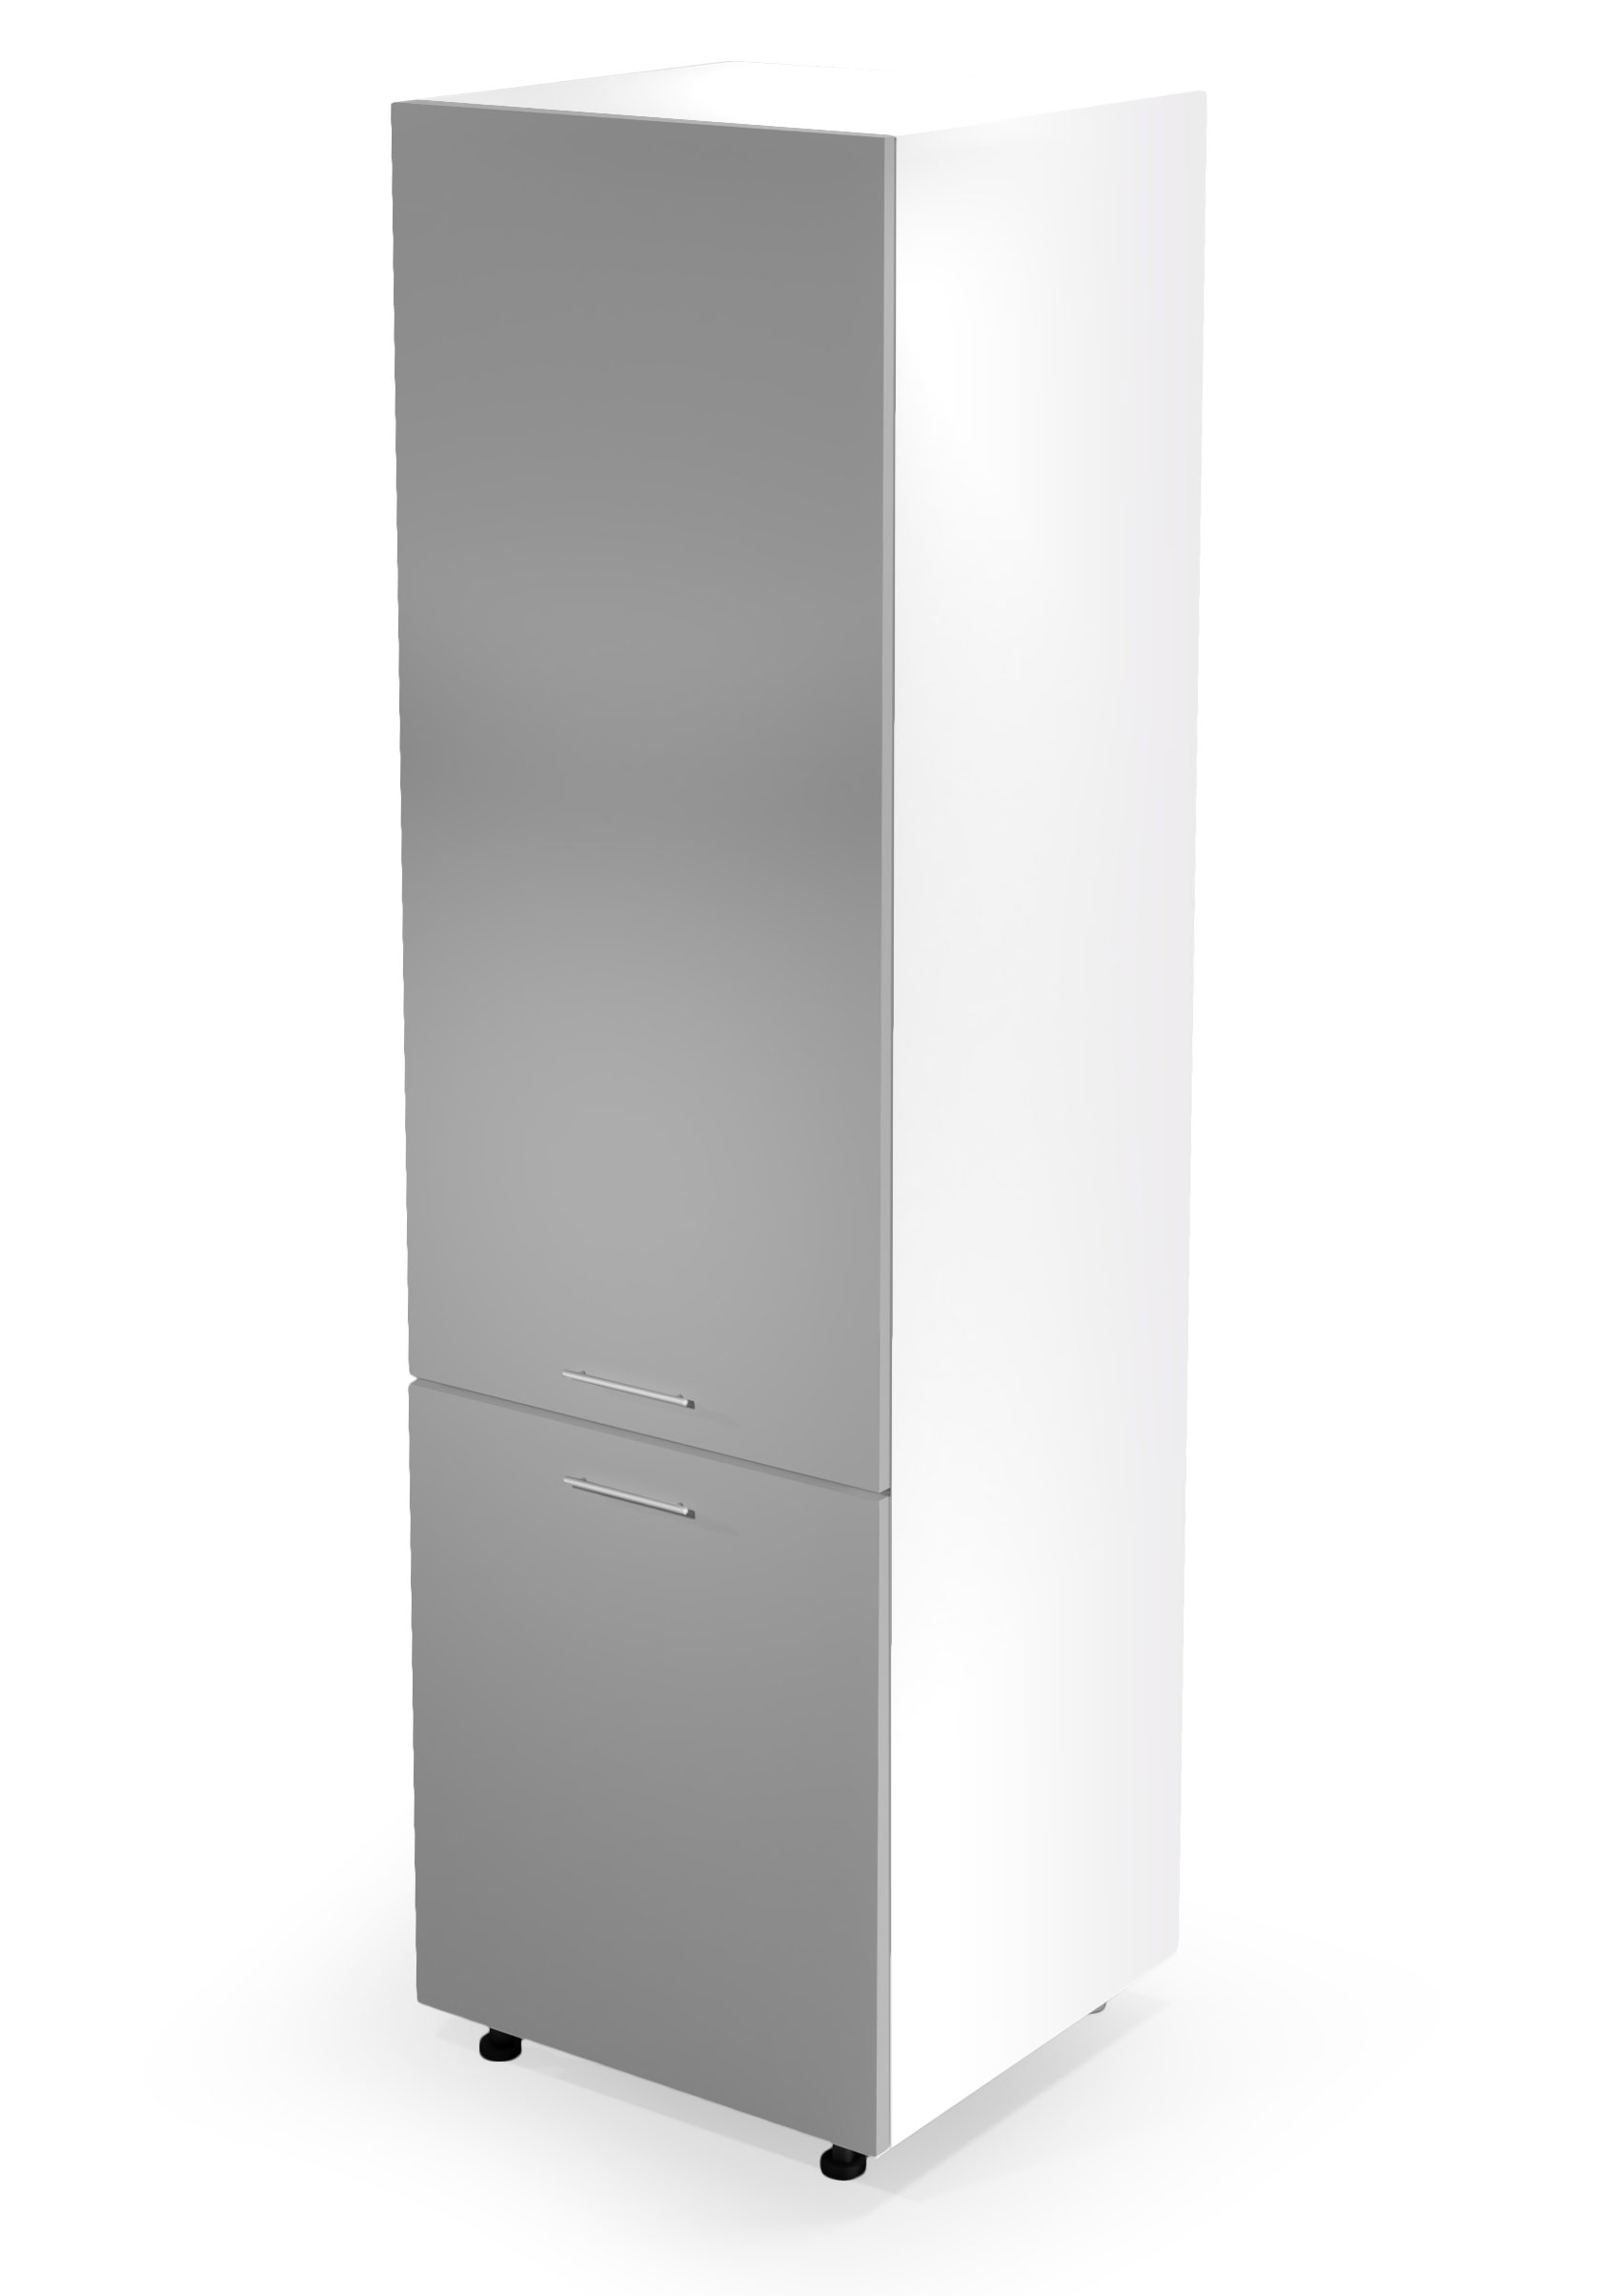 VENTO DL-60/214 szafka dolna wysoka front: jasny popiel (2p=1szt)